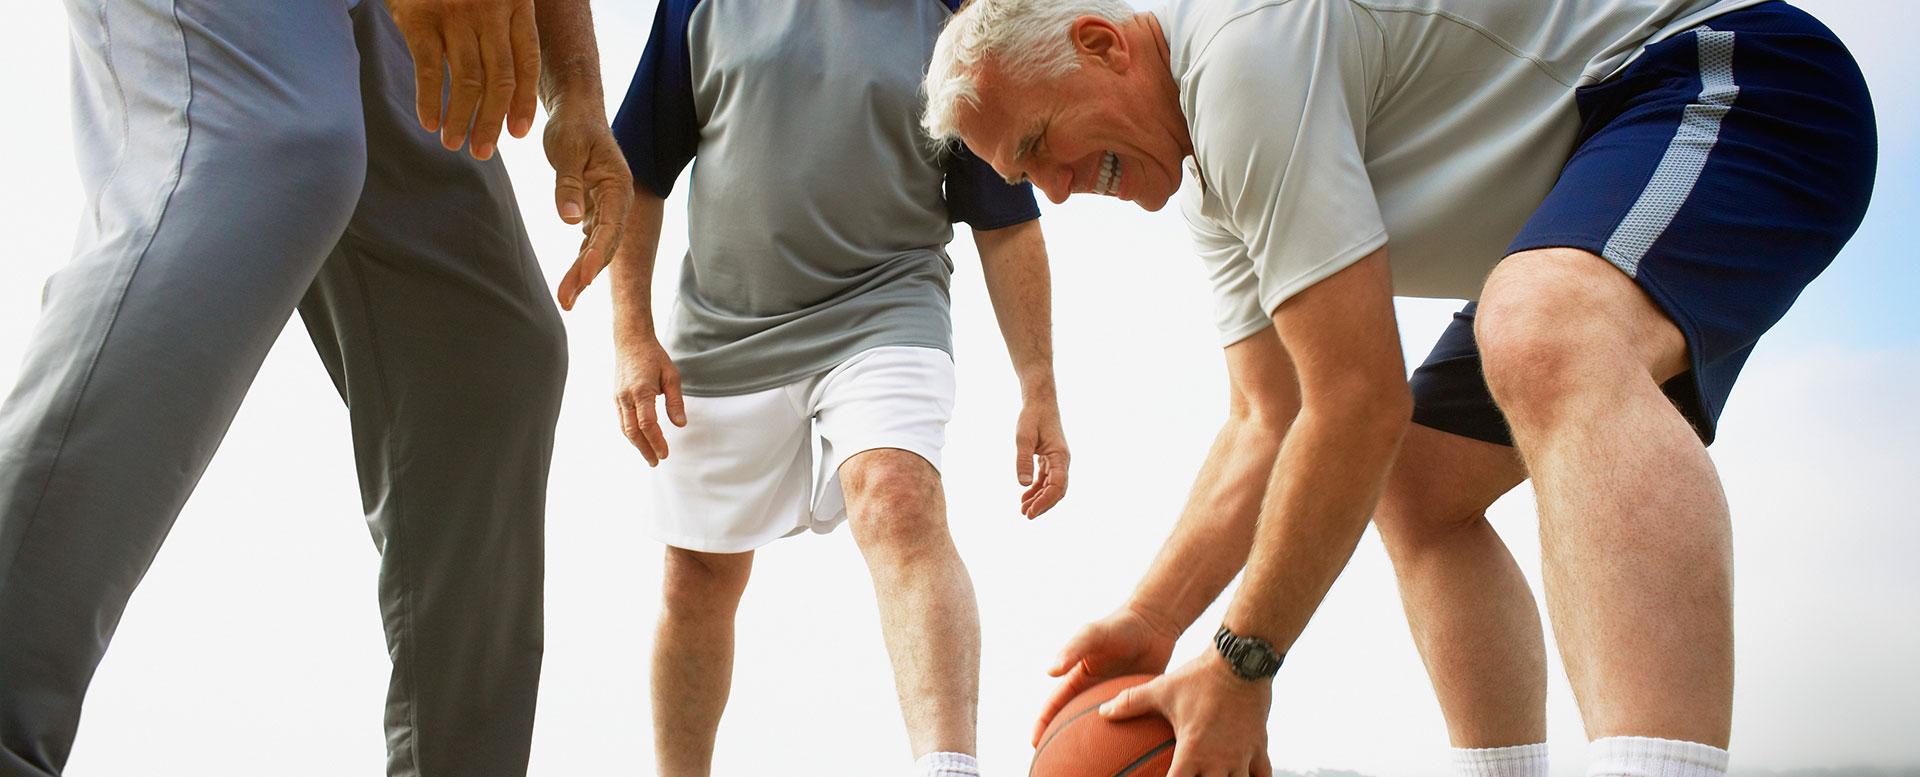 Senioren beim Basketball